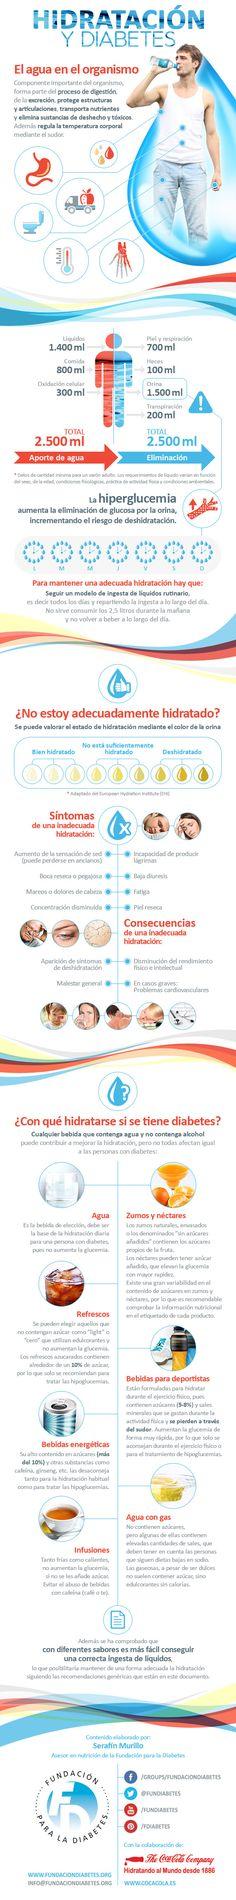 Auriculoterapia para bajar de peso foro univision